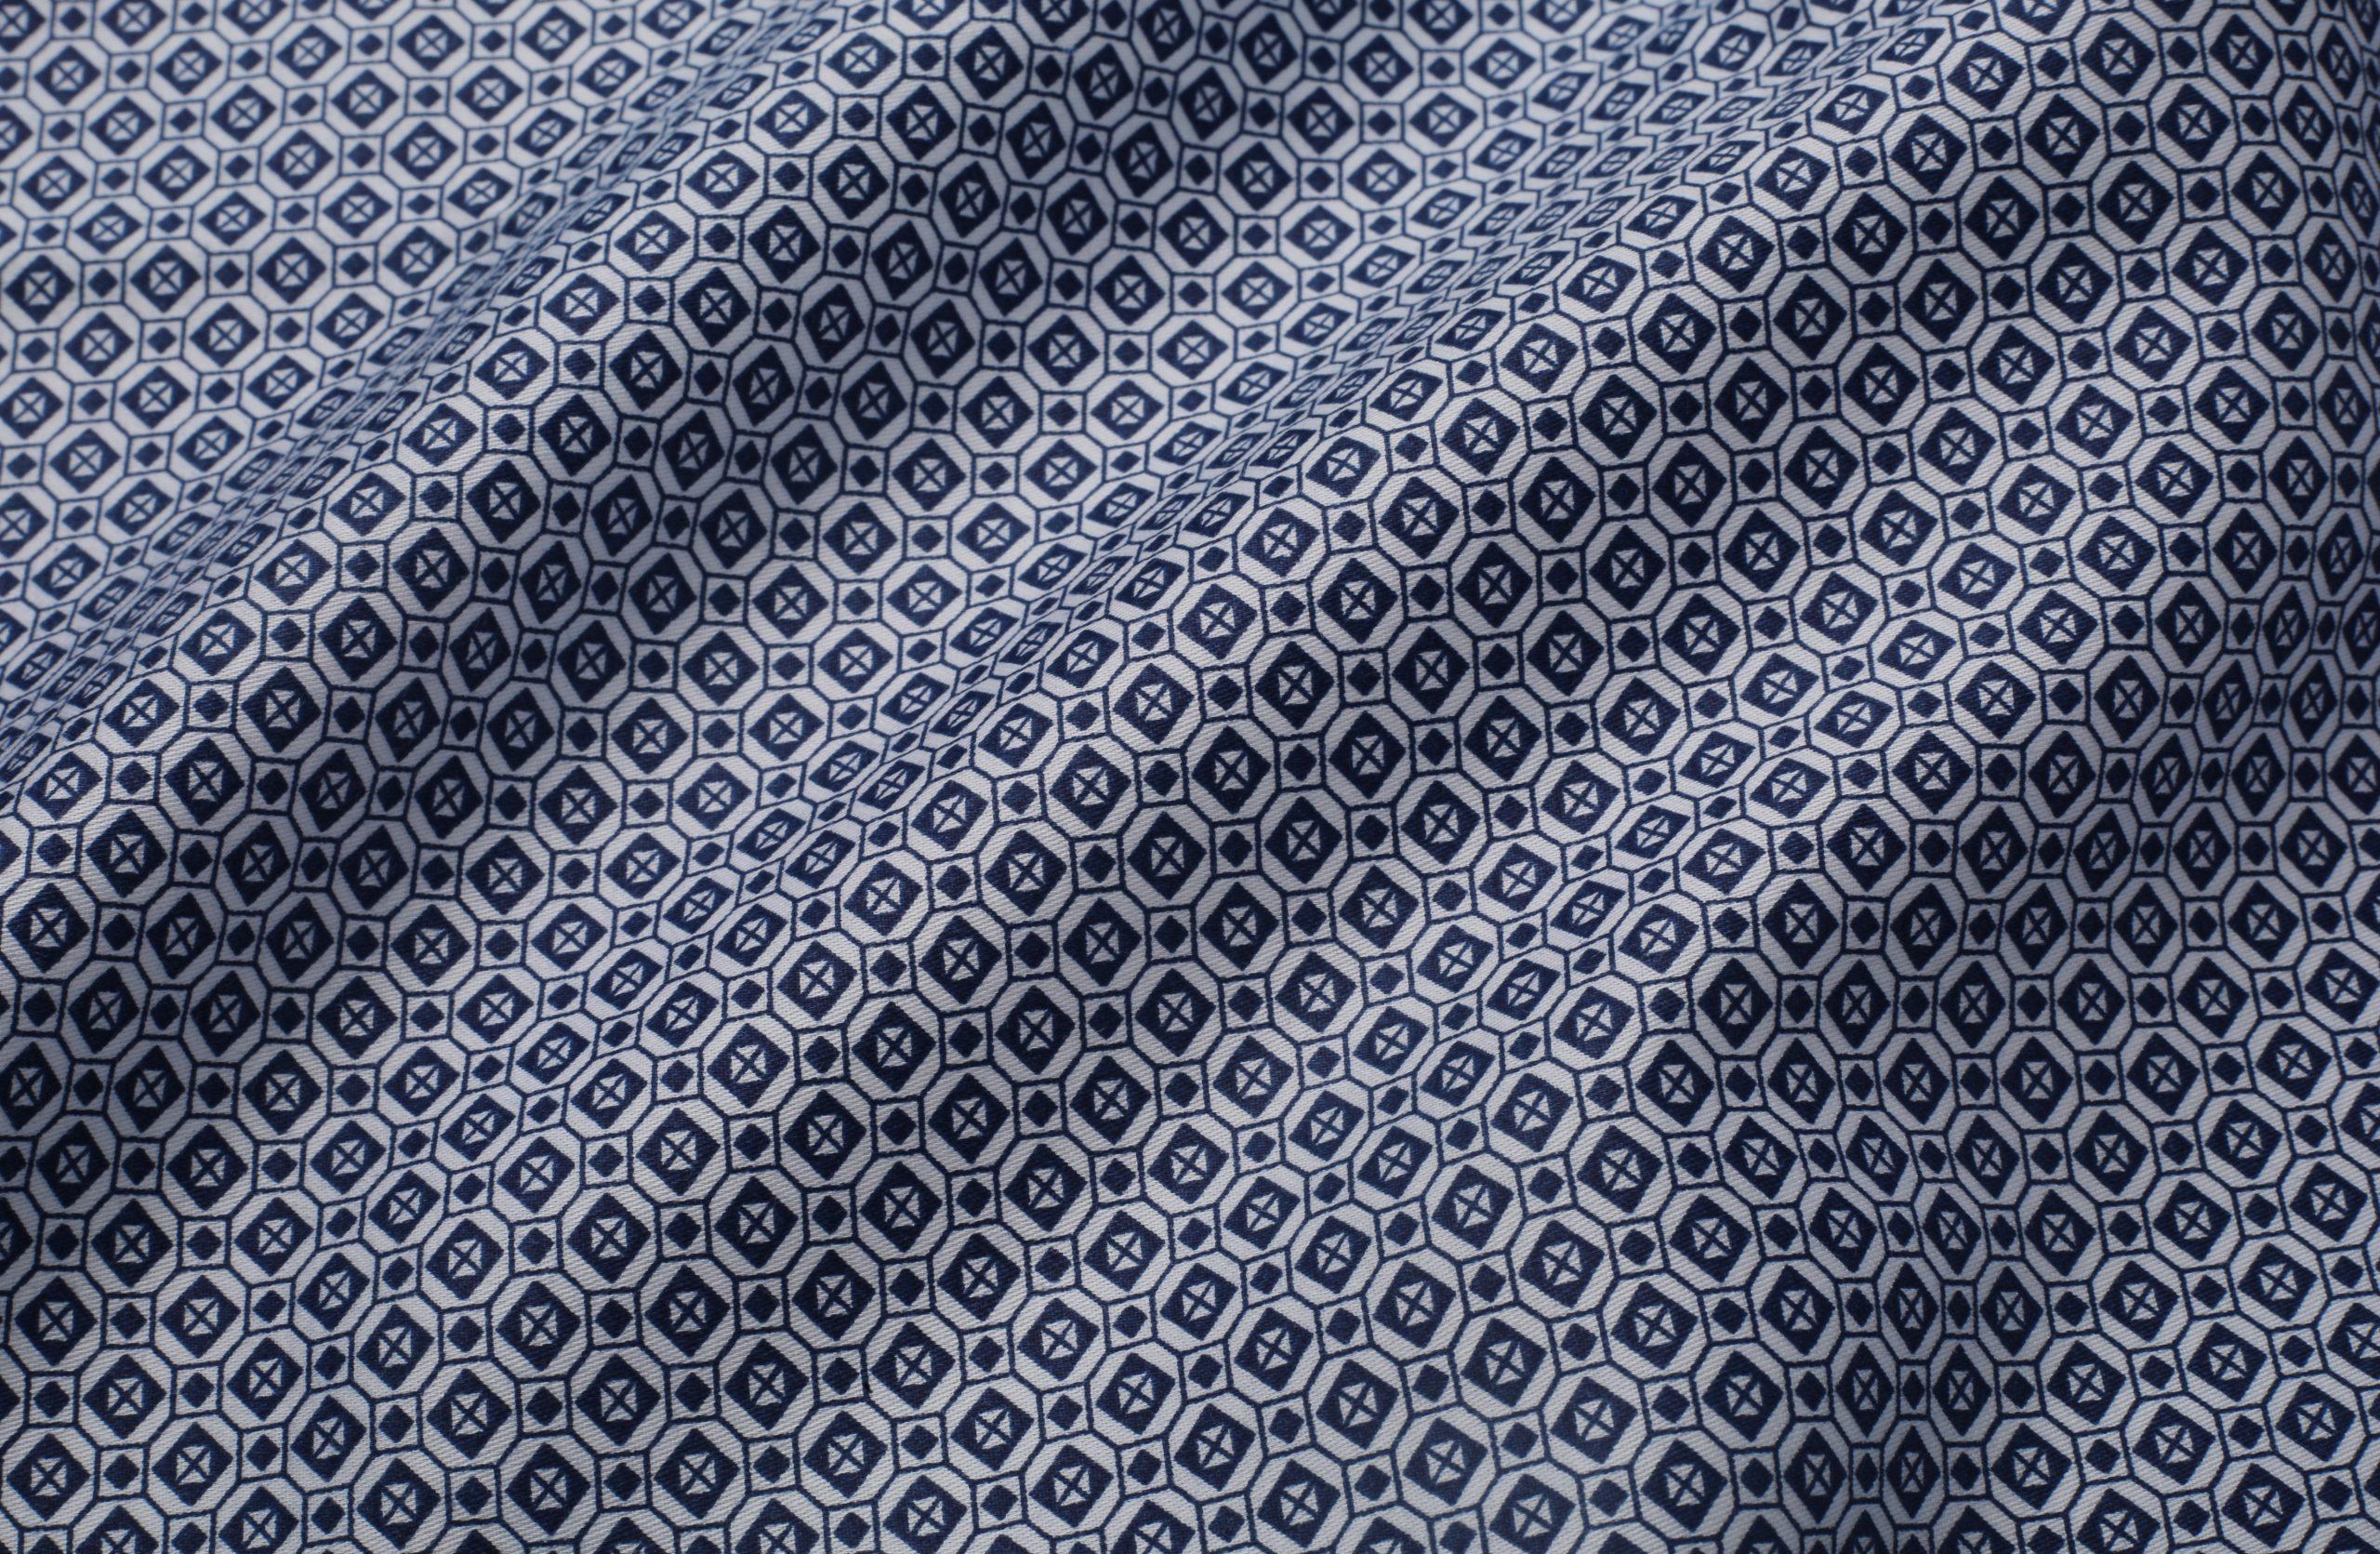 Procian prints shirtings